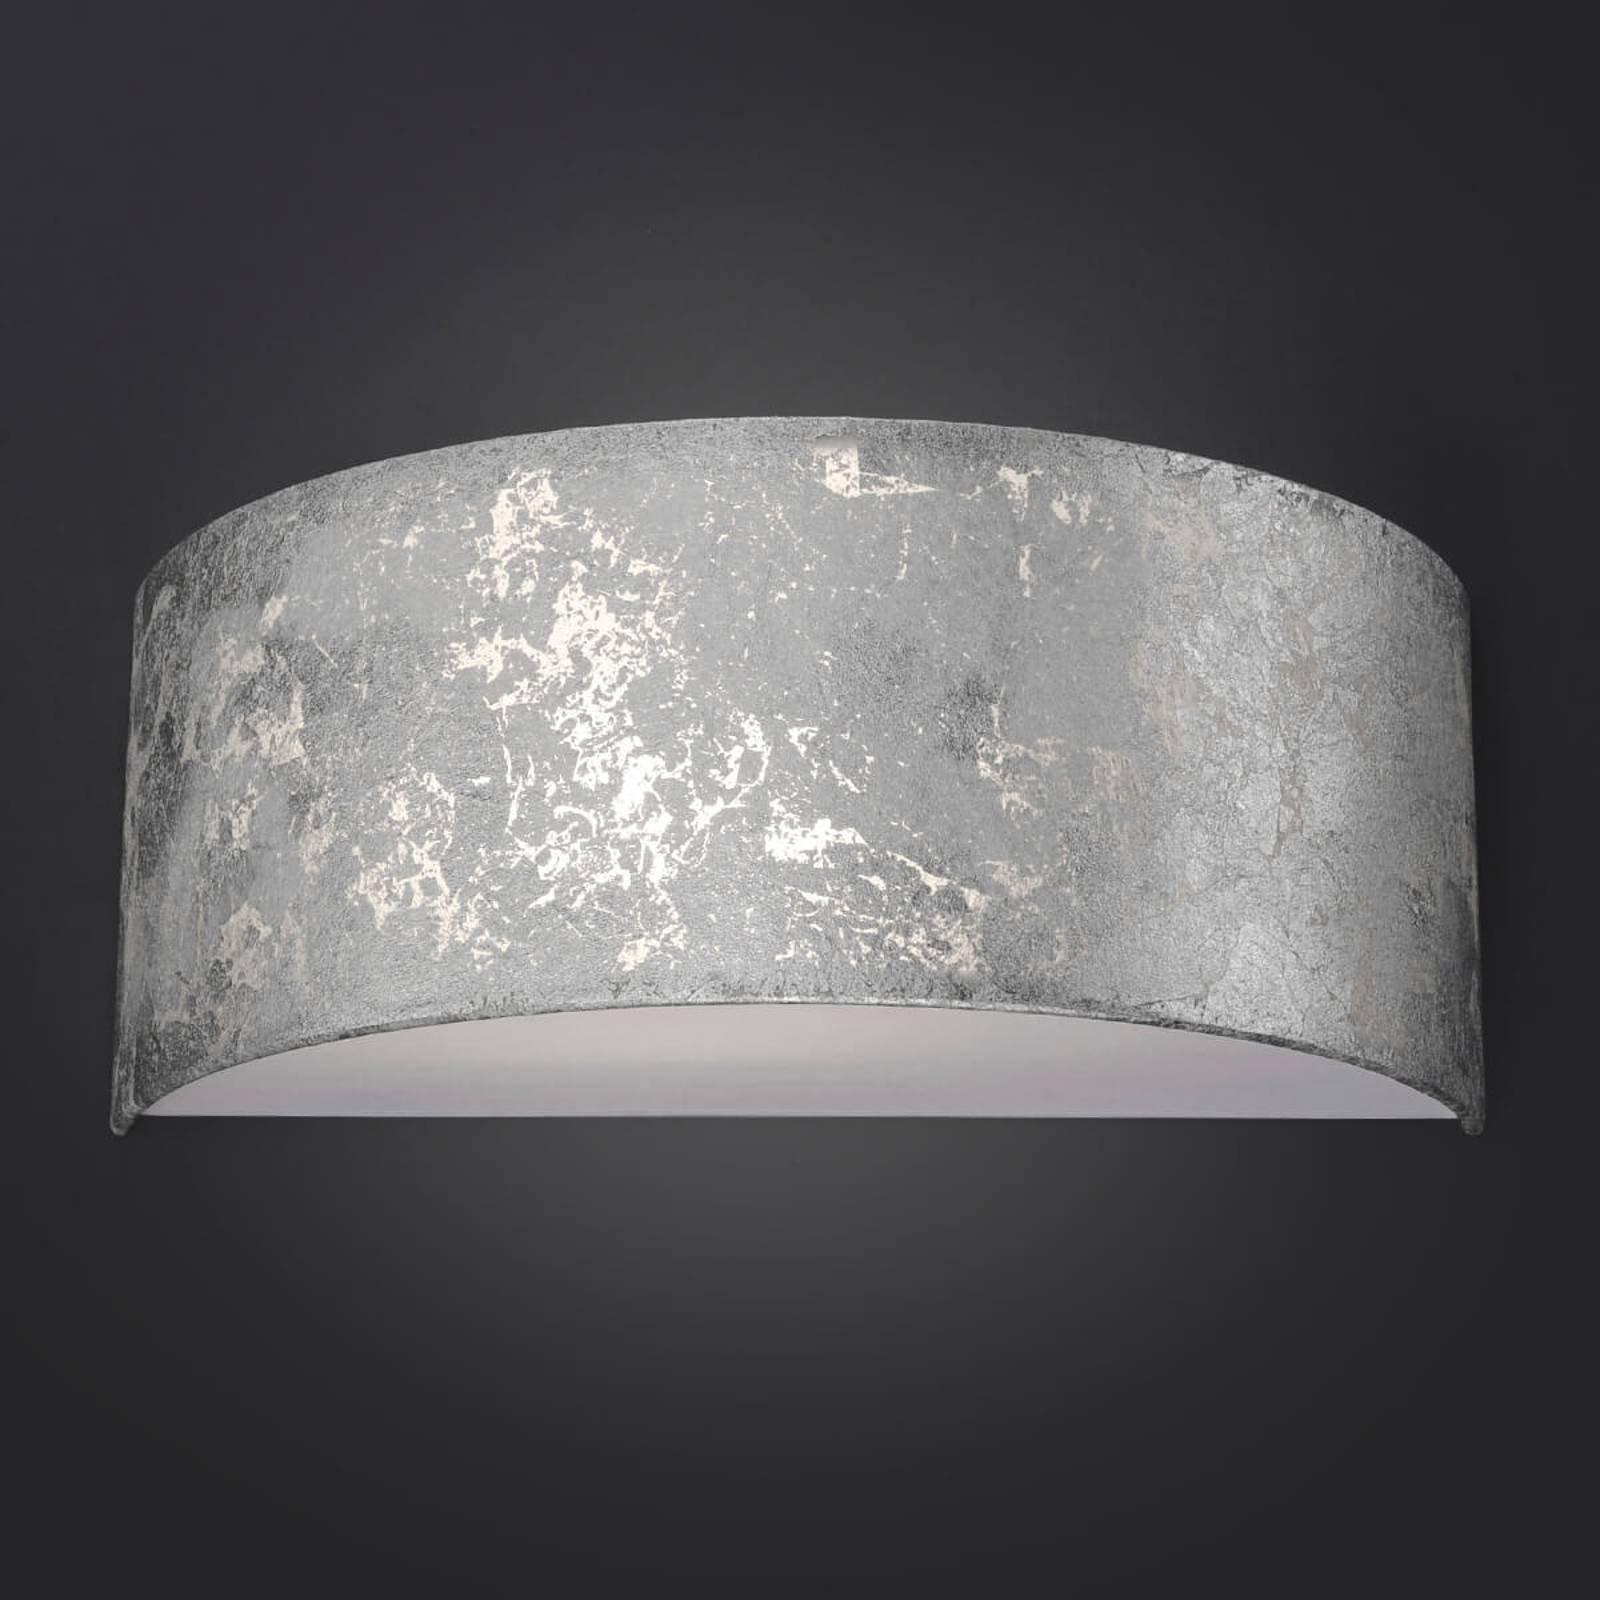 LED-vegglampe Alea med bladsølv, dimbar